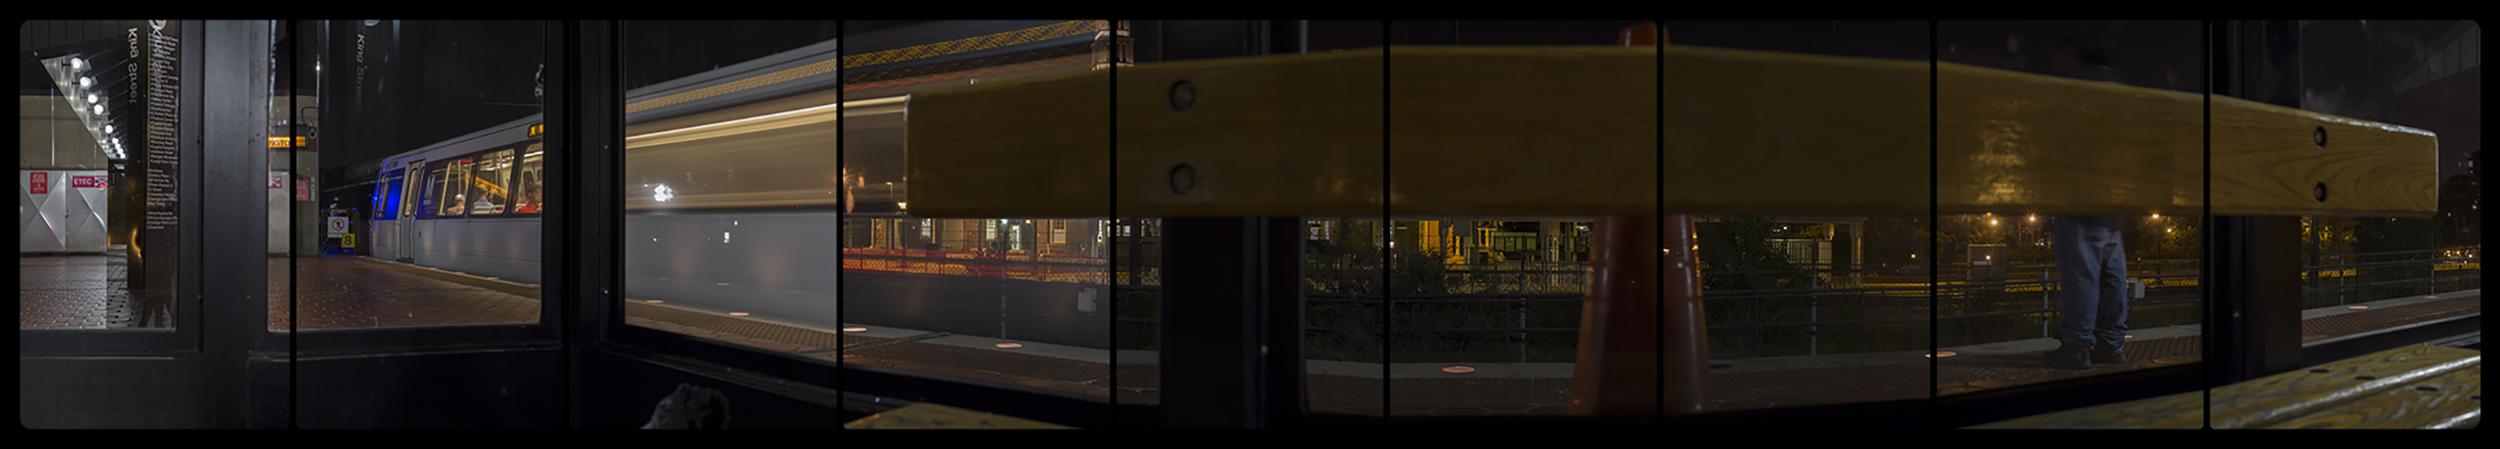 Metro Rail, King-Street Old Town,6-27-2014,3695_3703